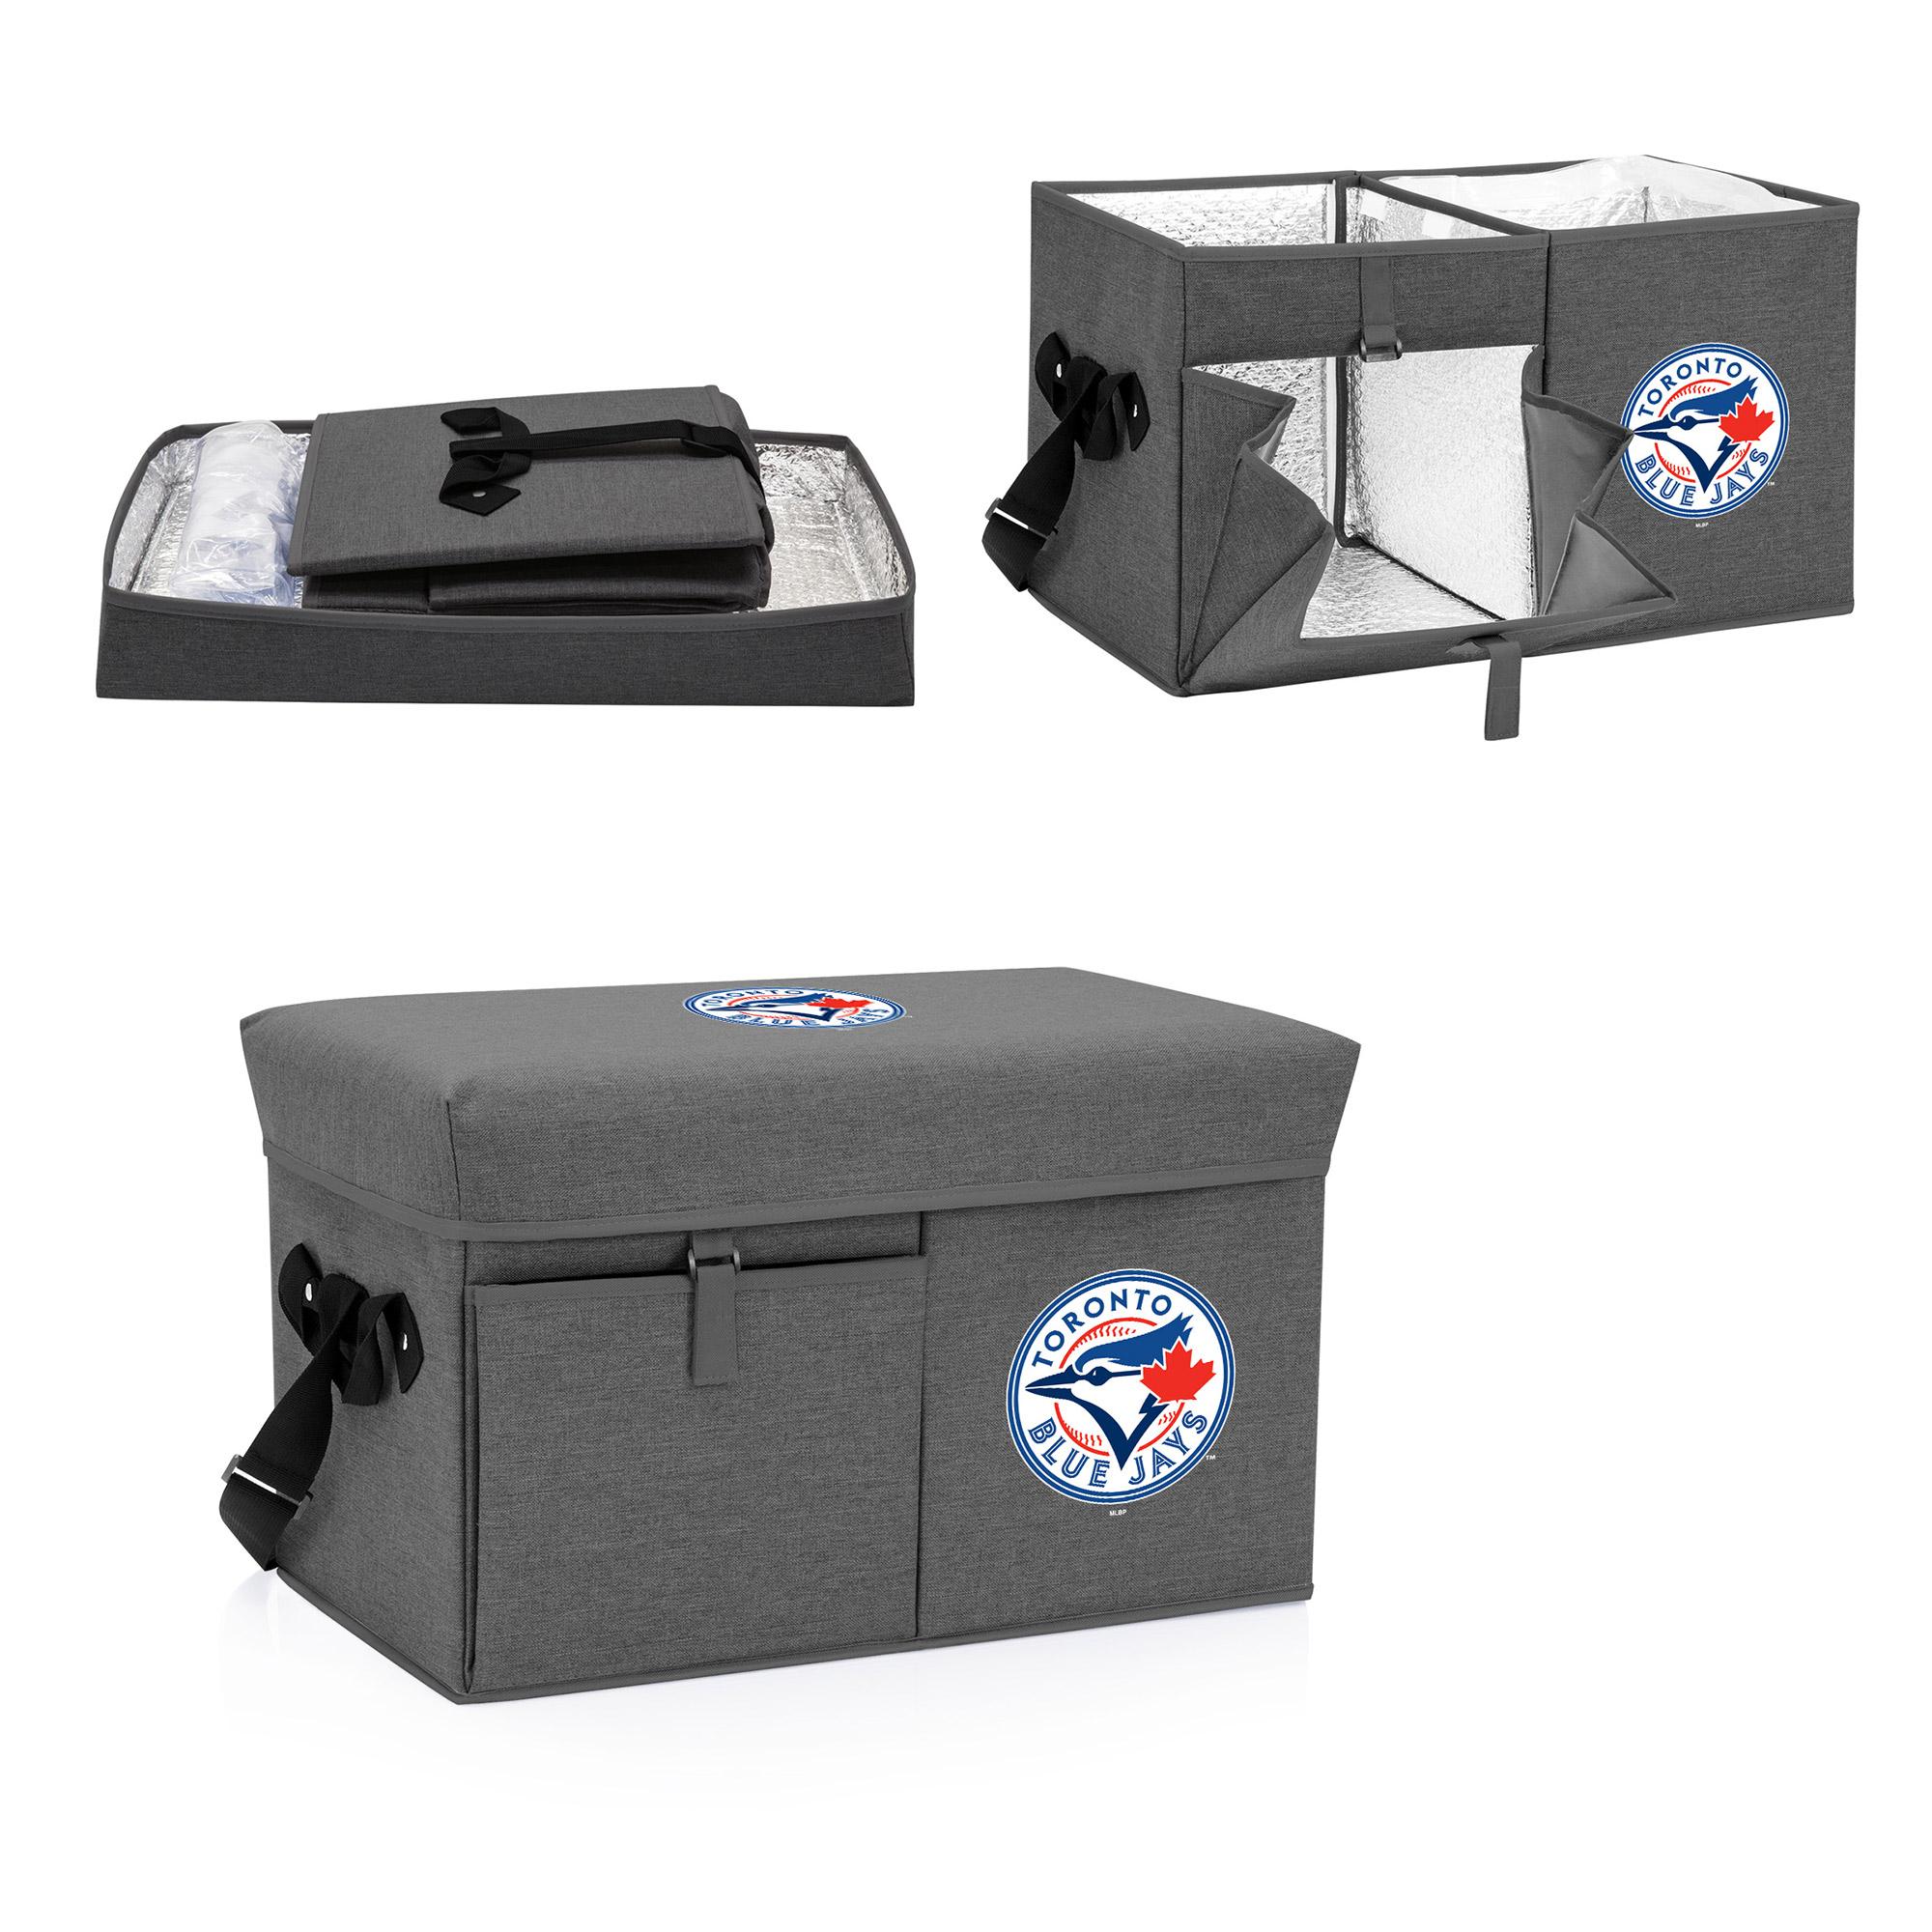 Toronto Blue Jays Ottoman Cooler & Seat - Gray - No Size